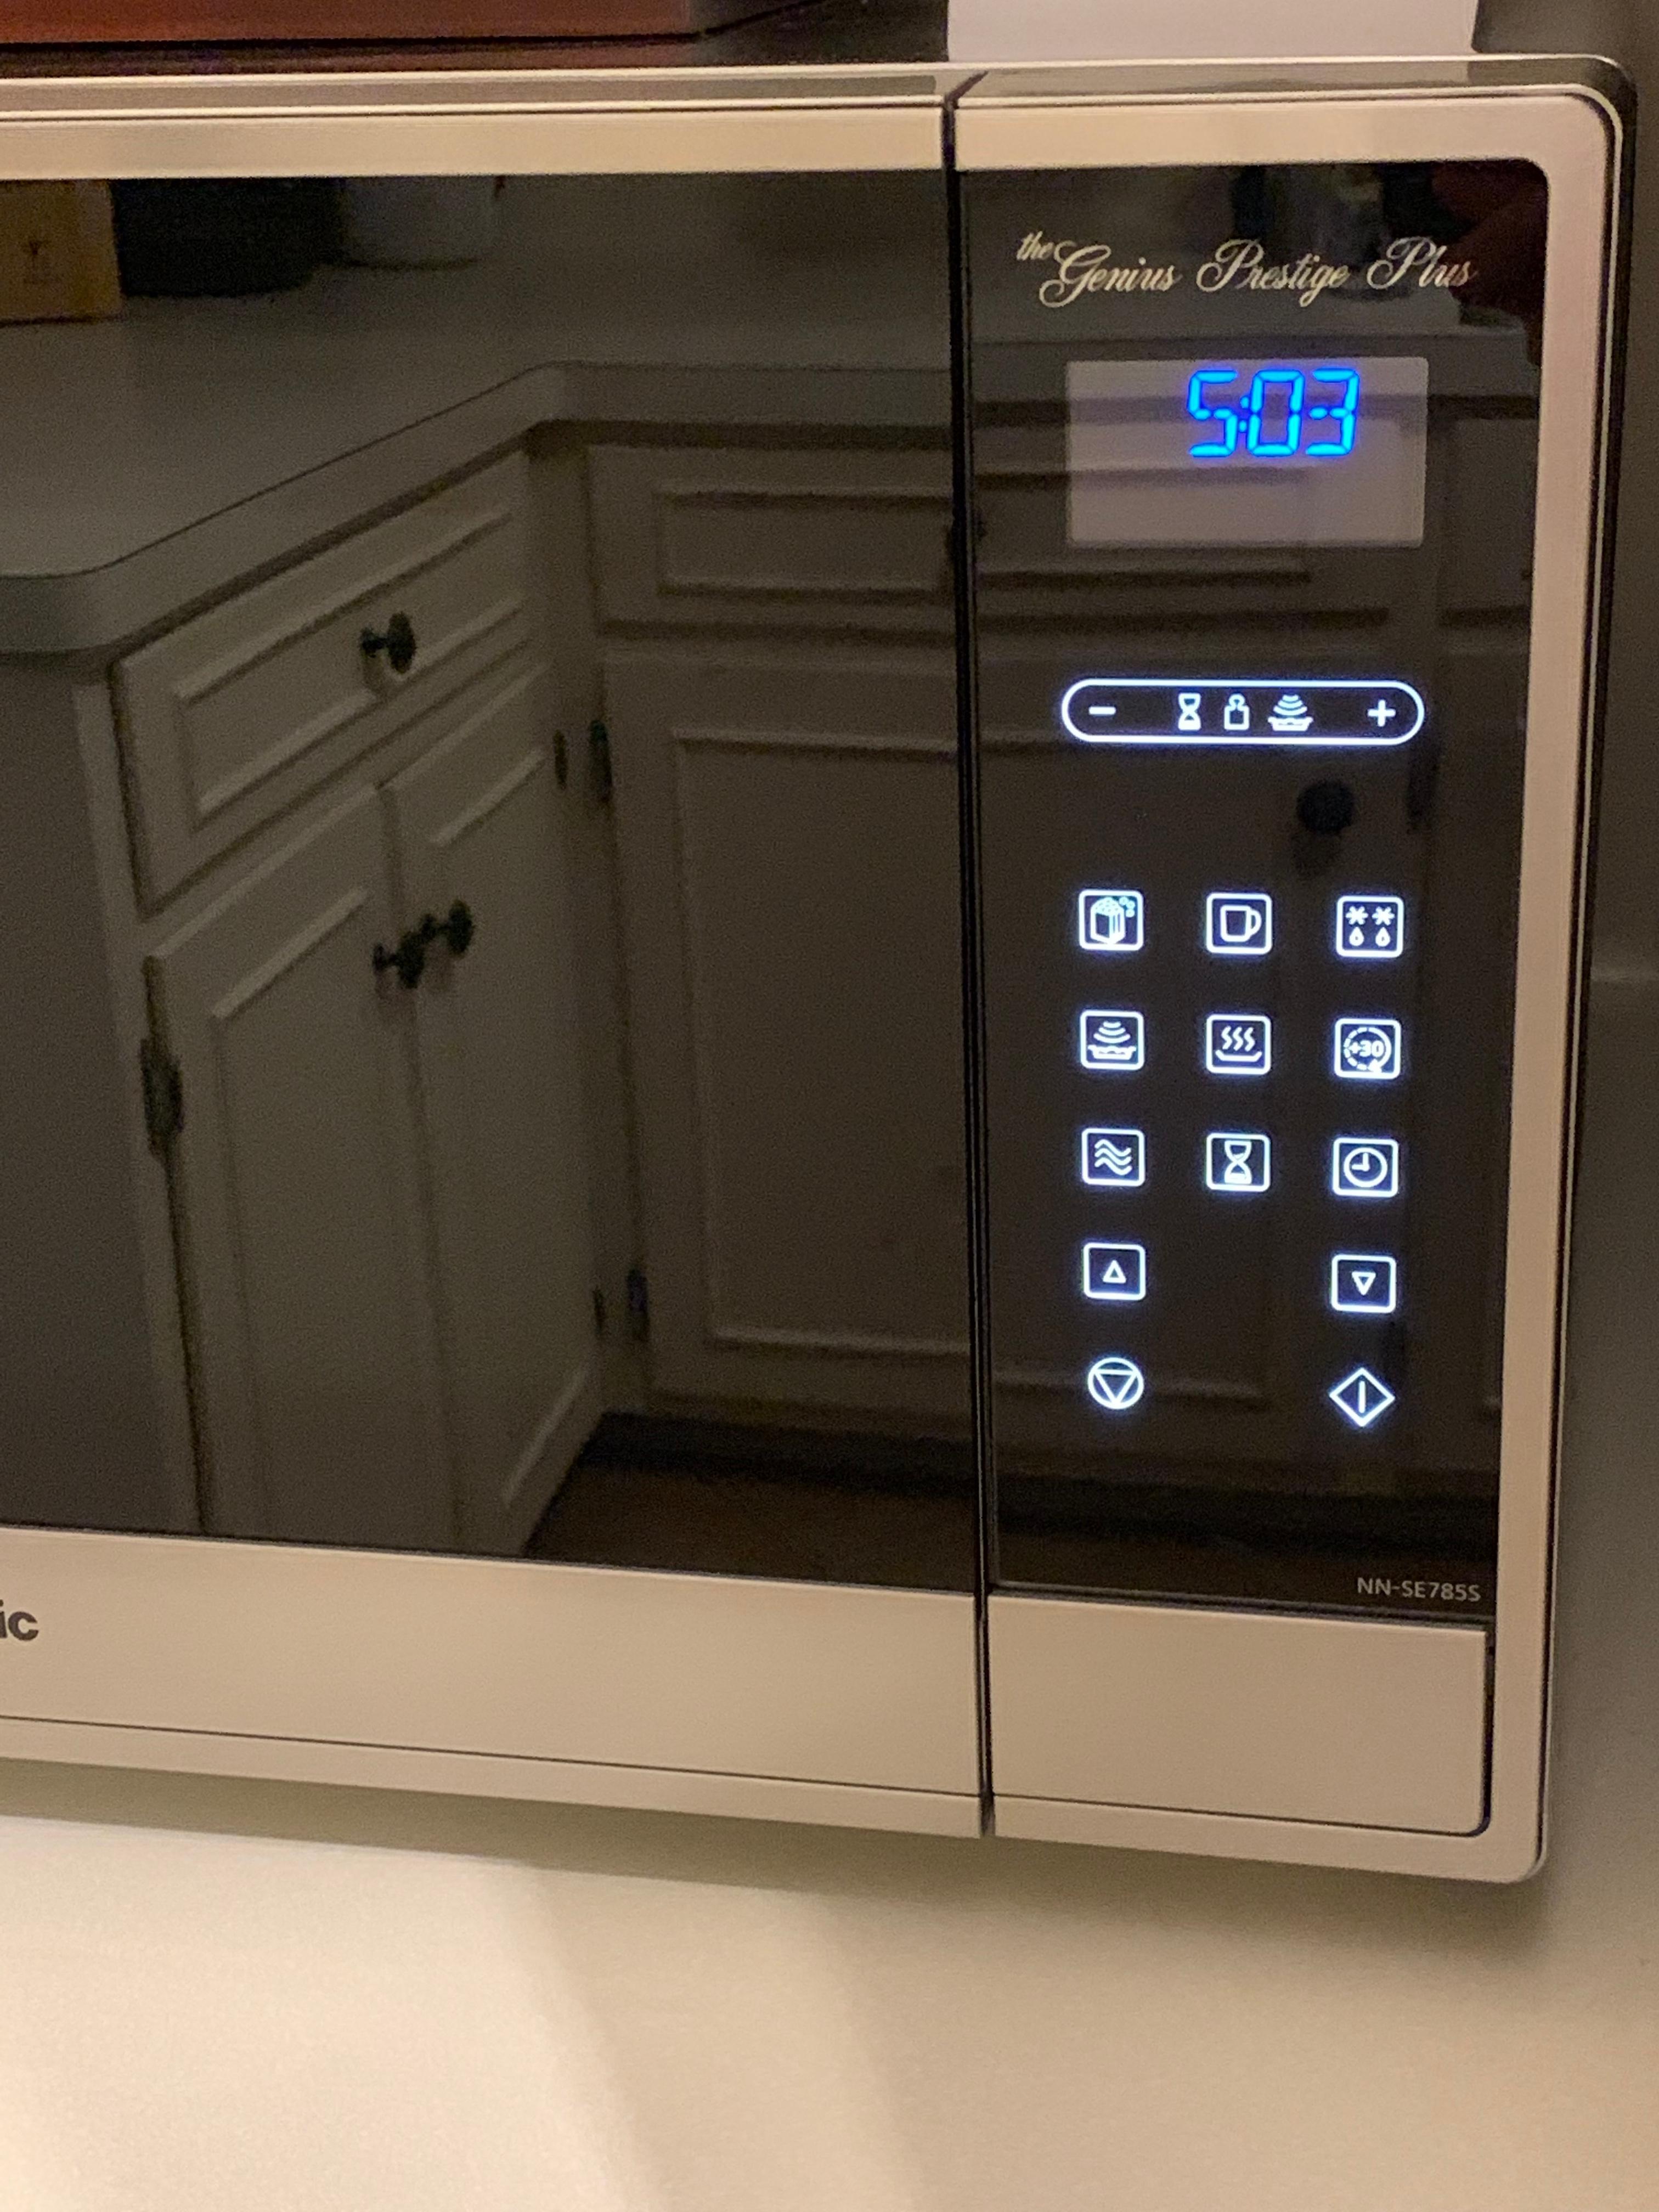 panasonic genius prestige plus 1 6 cu ft microwave with sensor cooking stainless steel